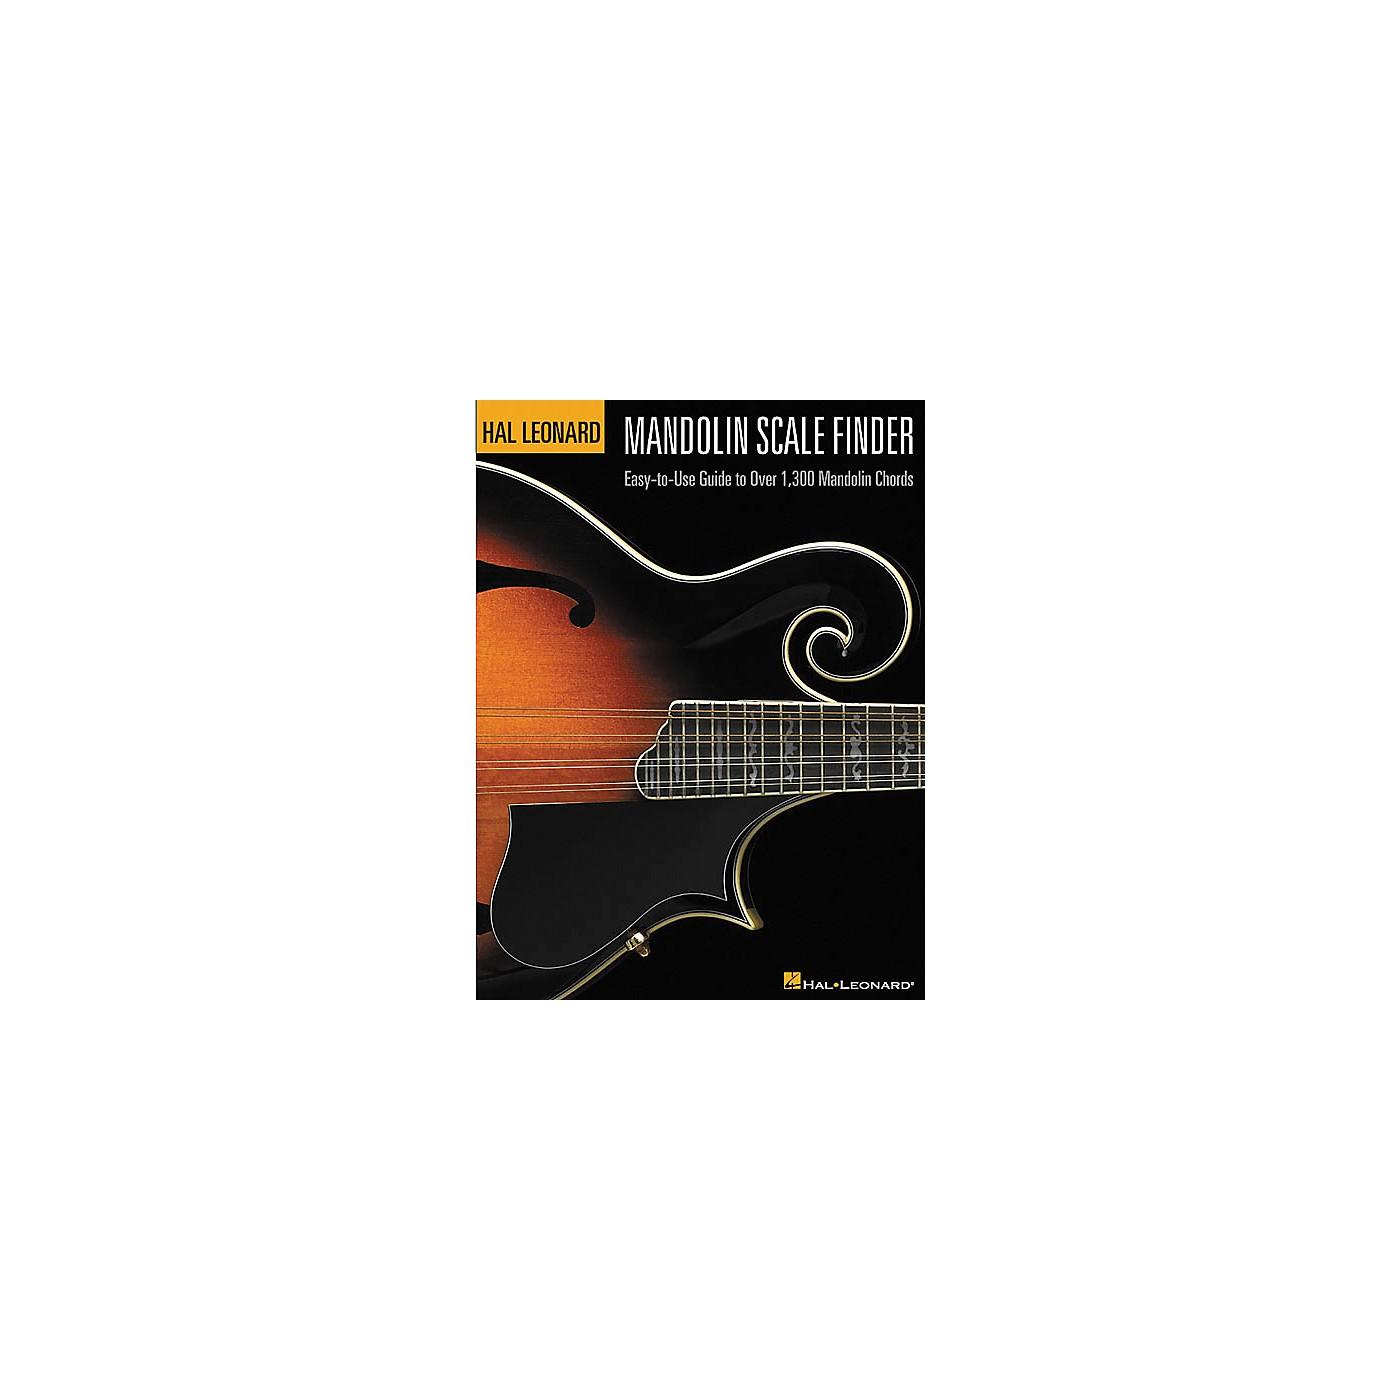 Hal Leonard Mandolin Scale Finder 9x12 Book thumbnail